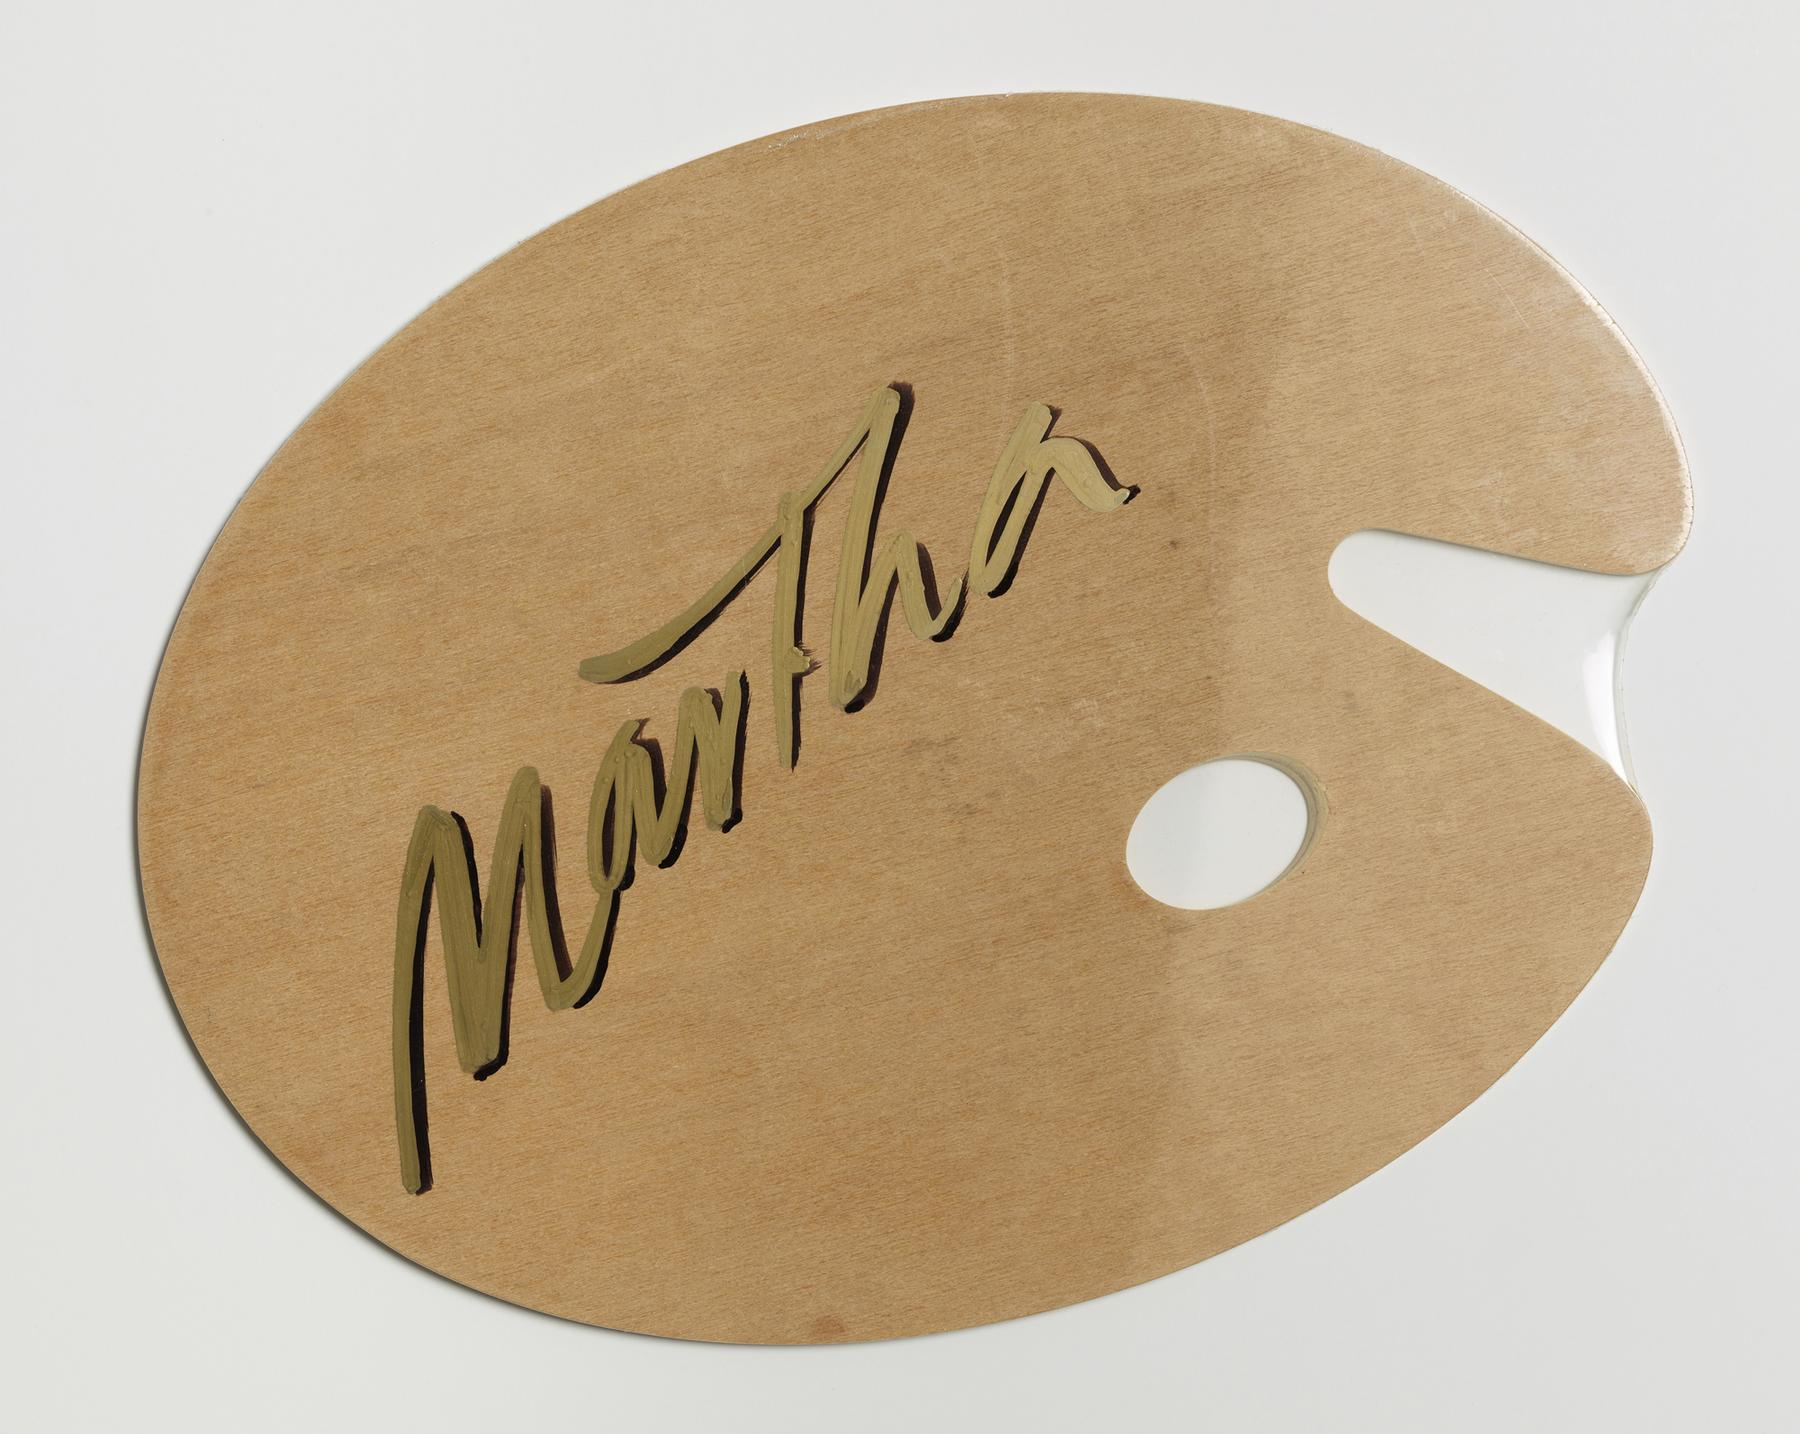 Seth Price Martha 2003